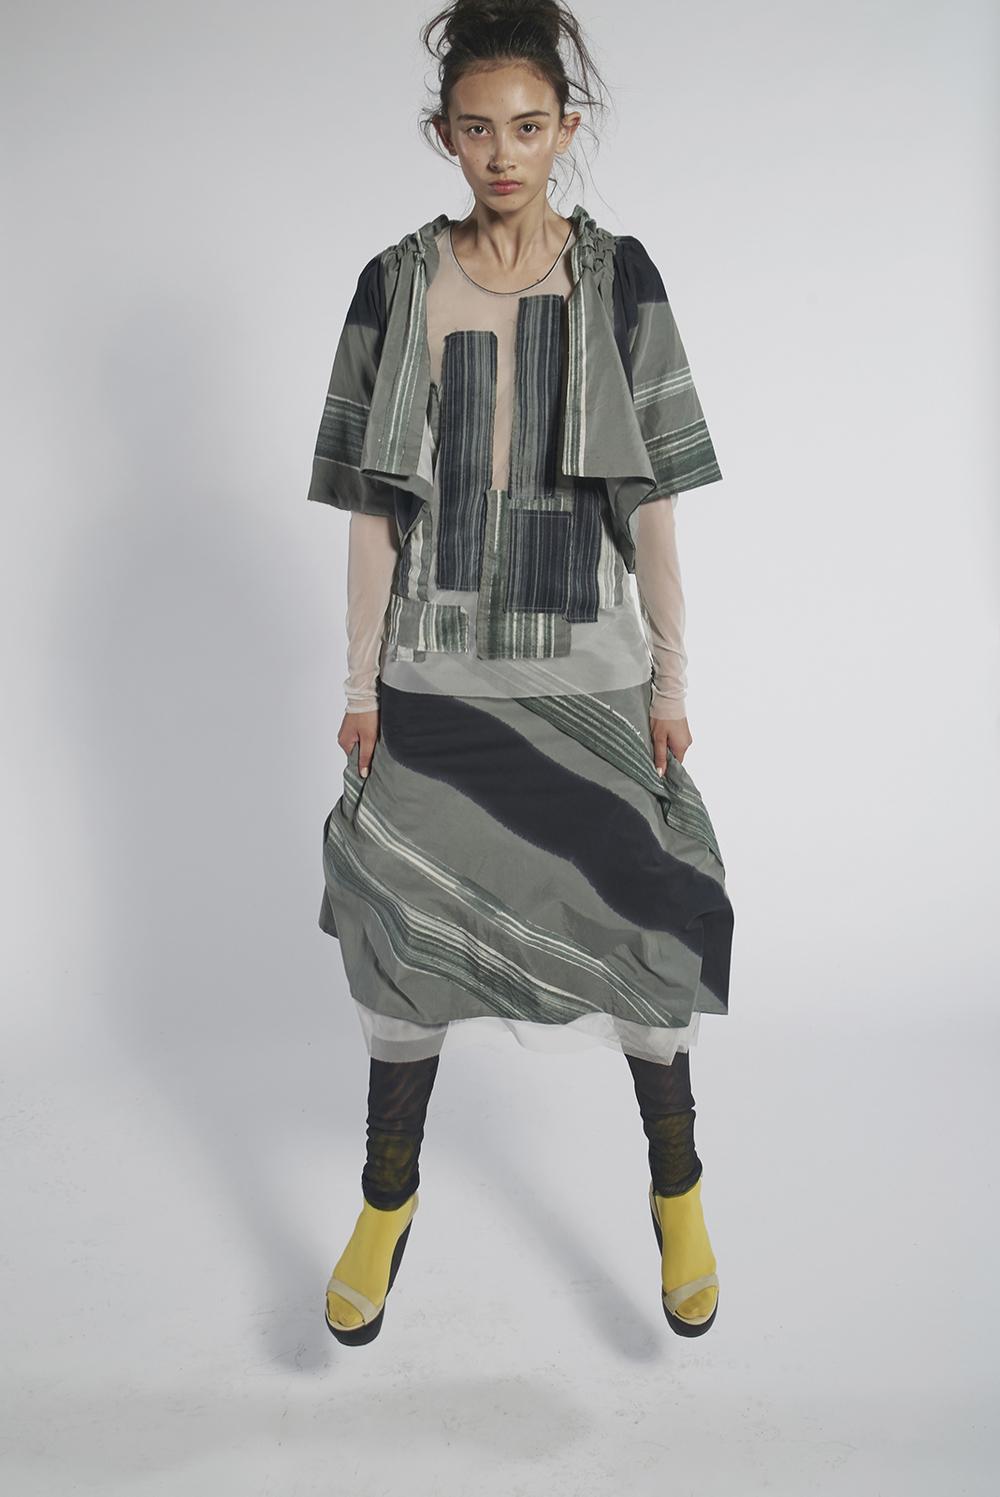 592/A158212 Origami Bolero 592/A153369 Batik Patchwork Tulle Top 592/A155234 Batik Dipped Skirt